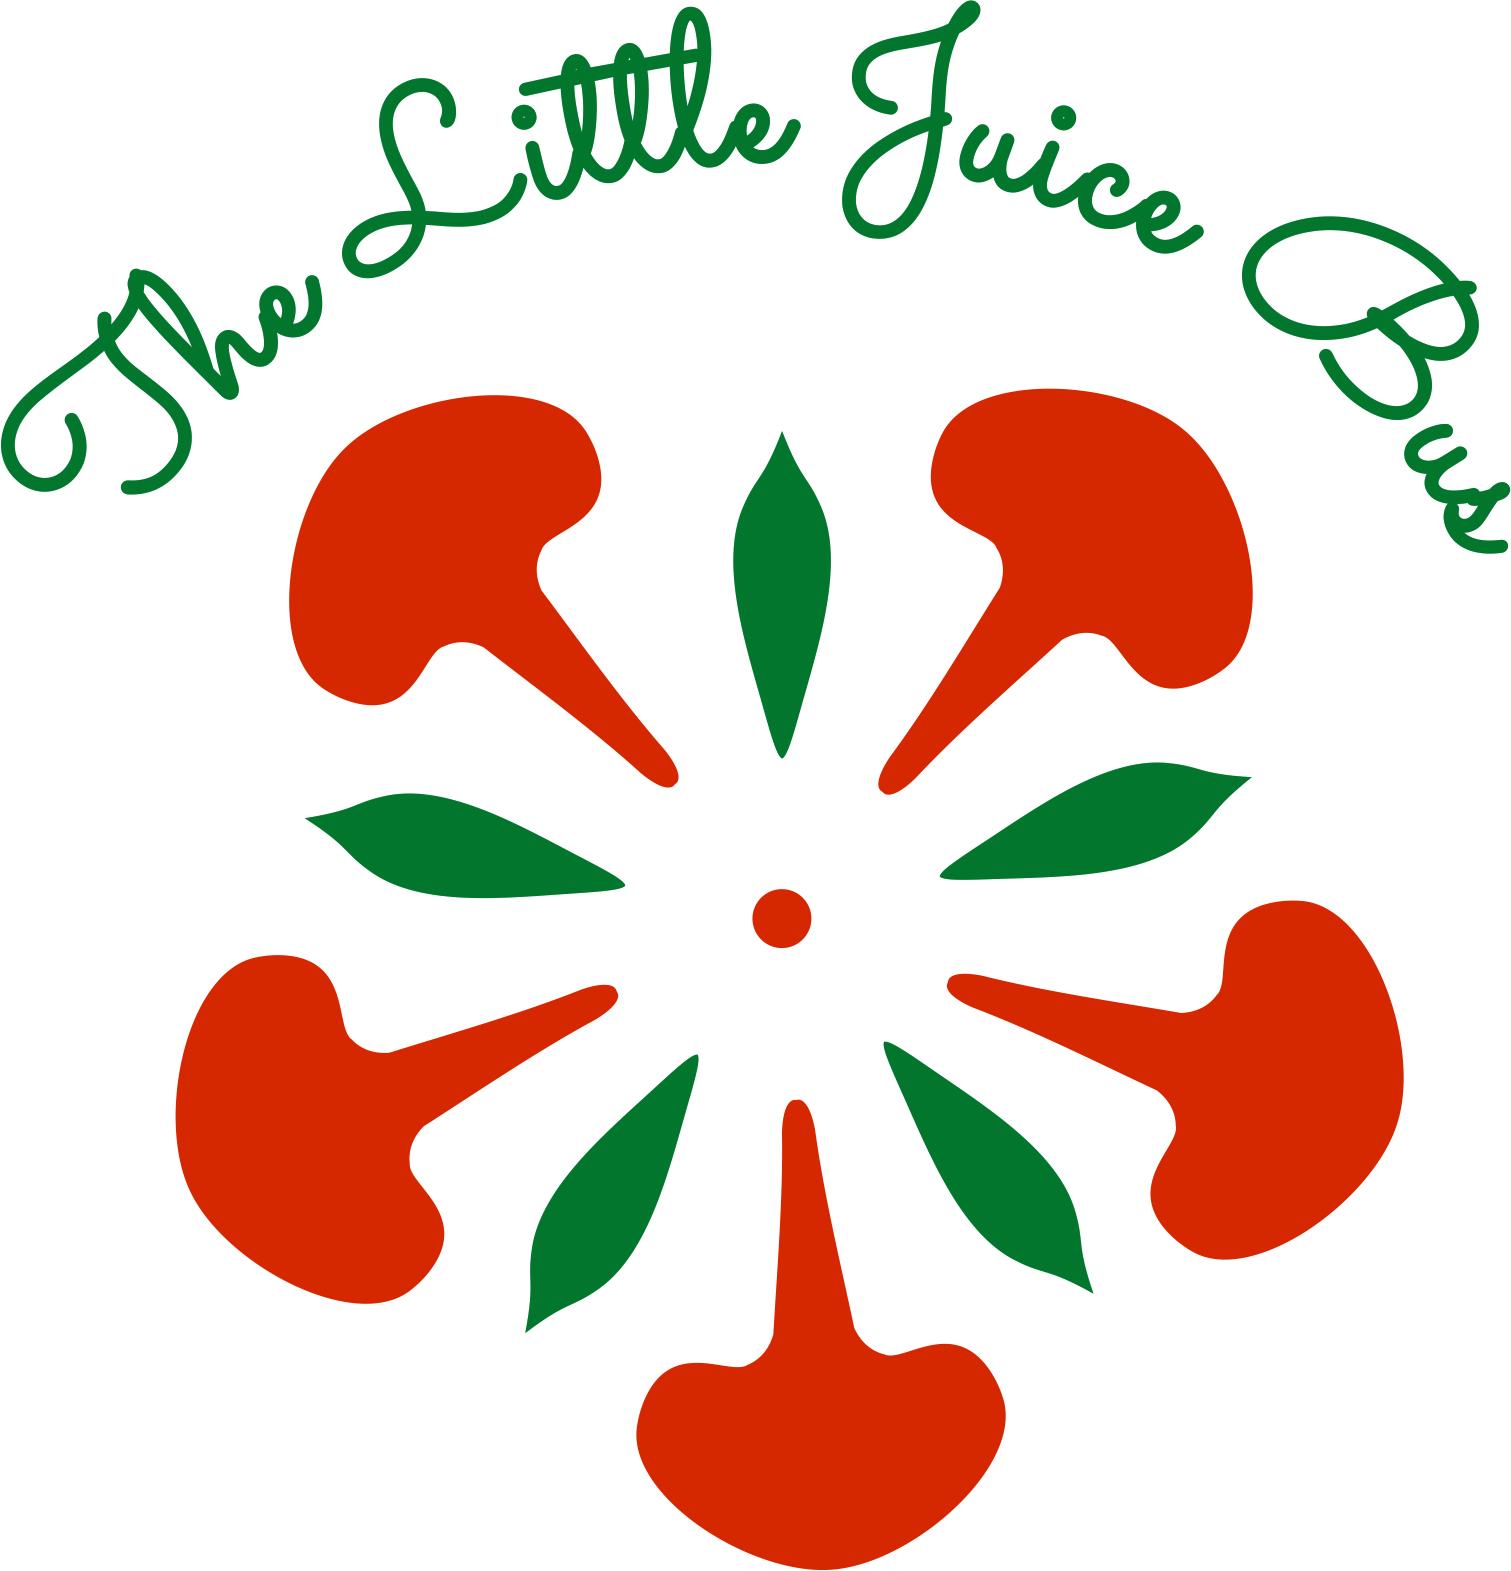 The Little Juice Bus